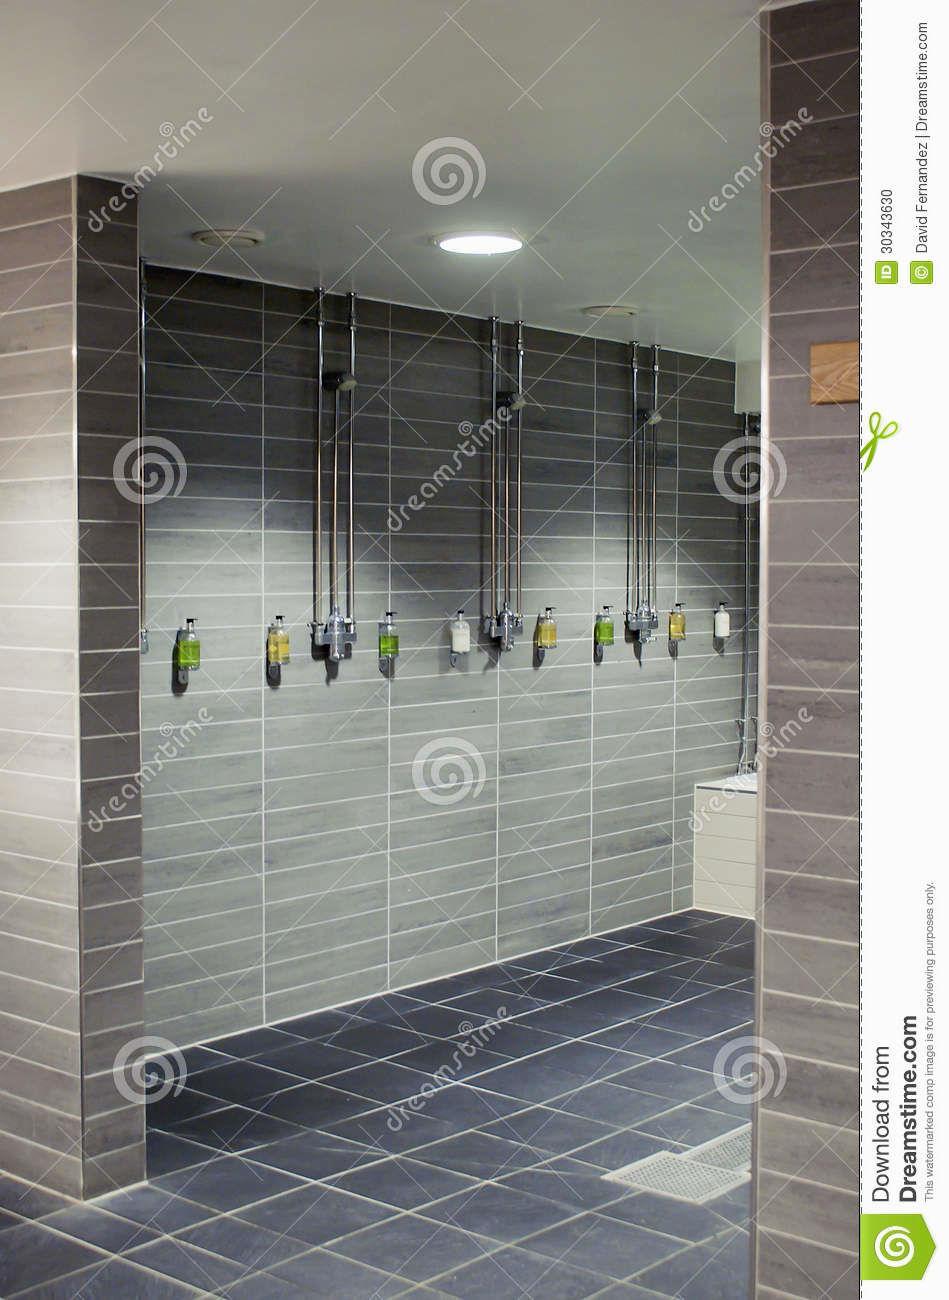 stylish bathroom shower tile ideas image-Amazing Bathroom Shower Tile Ideas Photo